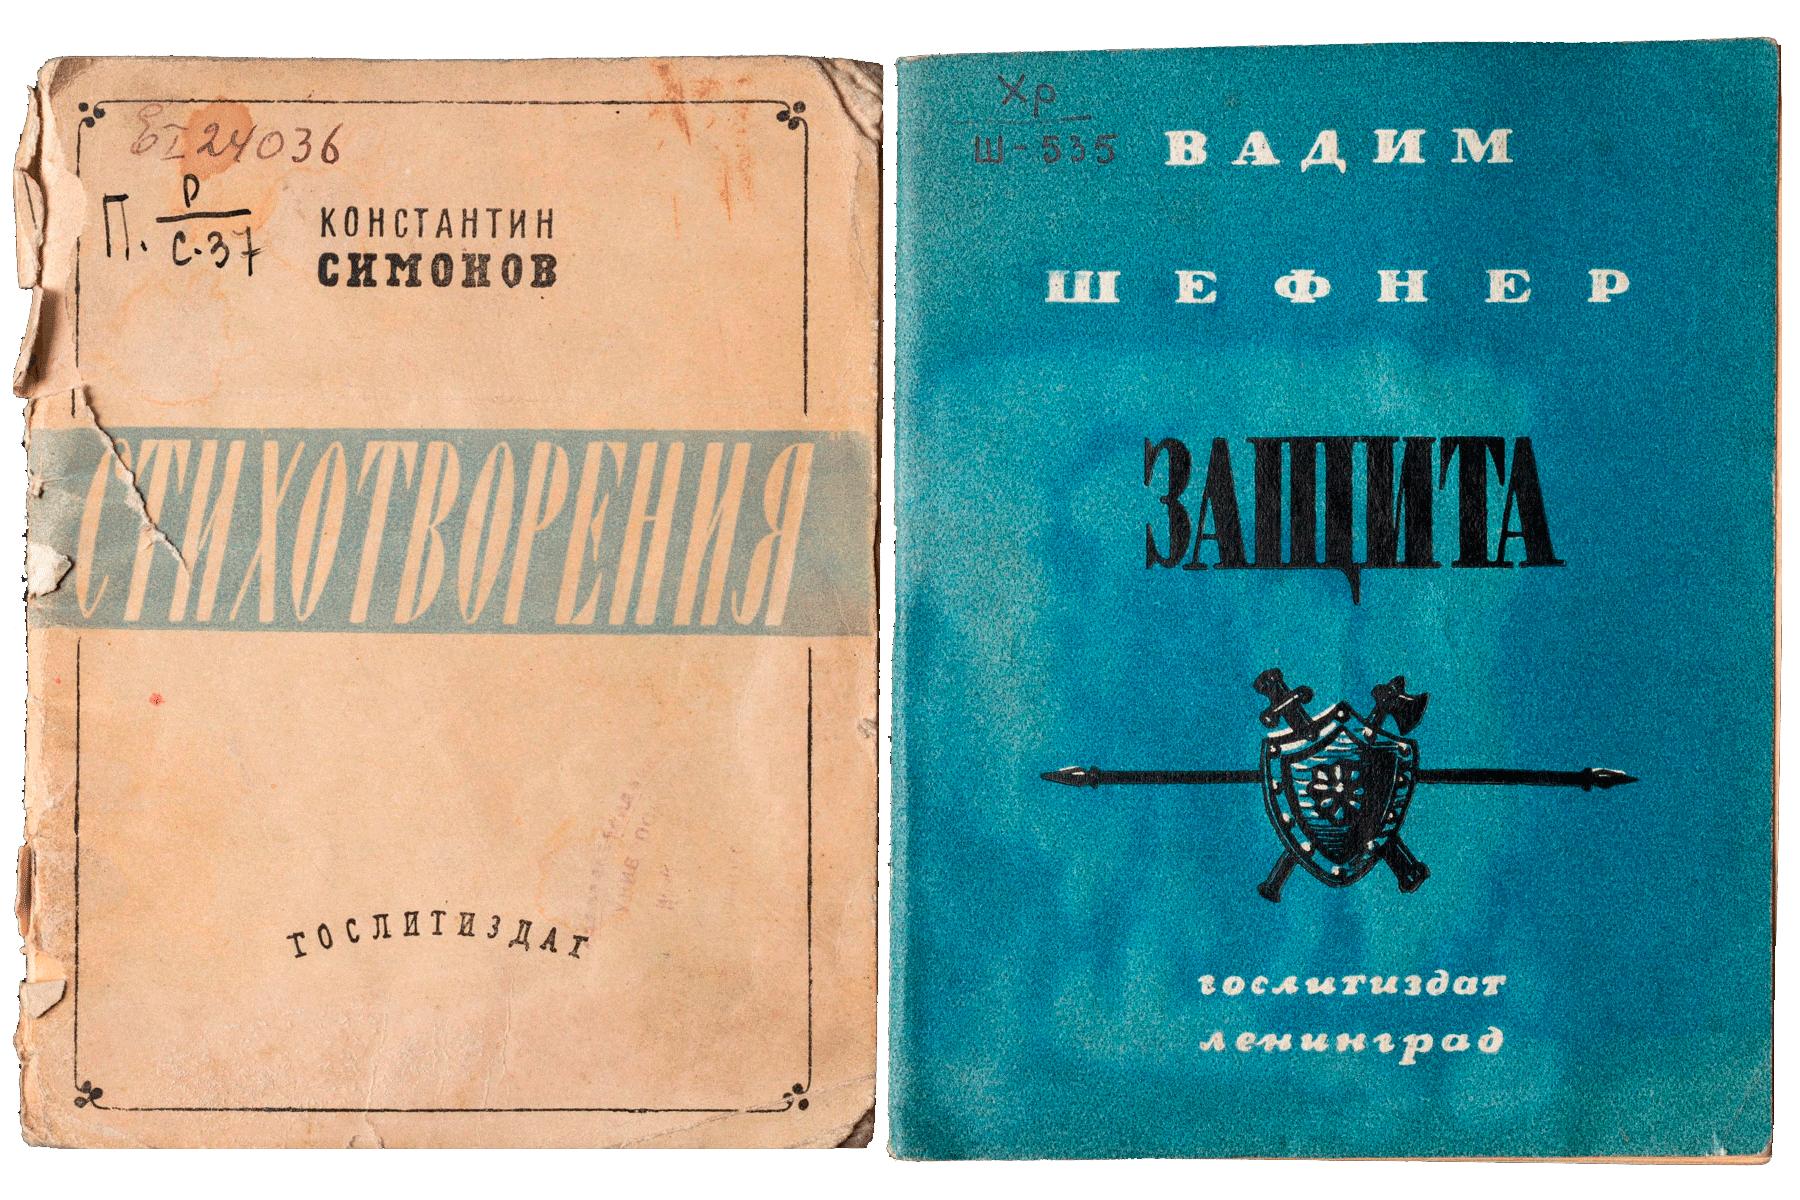 Константин Симонов. Стихотворения. 1942 год; Вадим Шефнер. Защита. 1943 год